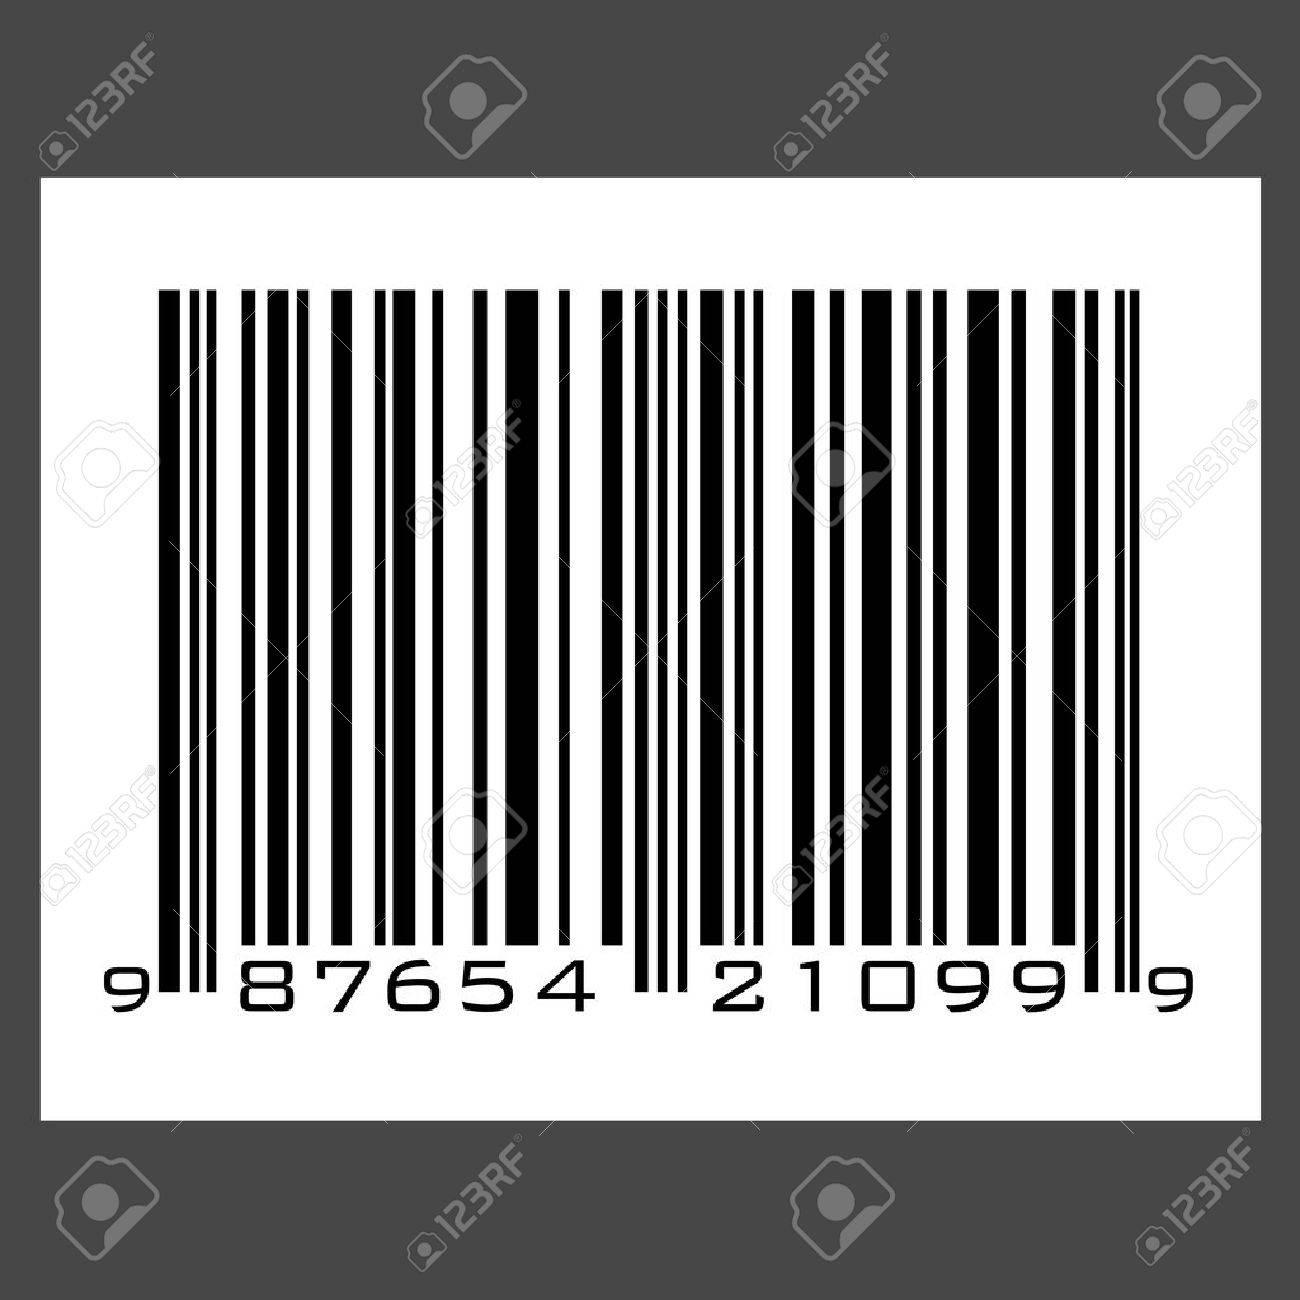 UPC barcode - vector